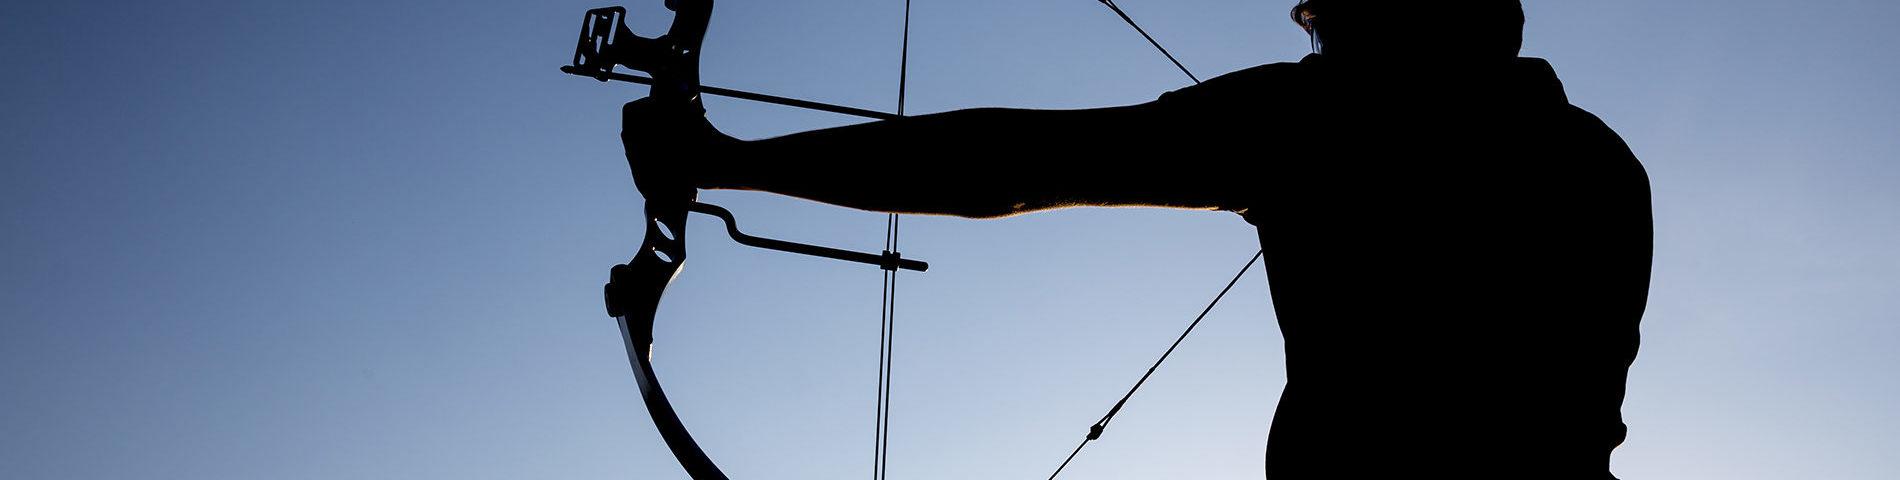 Exchange Archery with Da Vinci